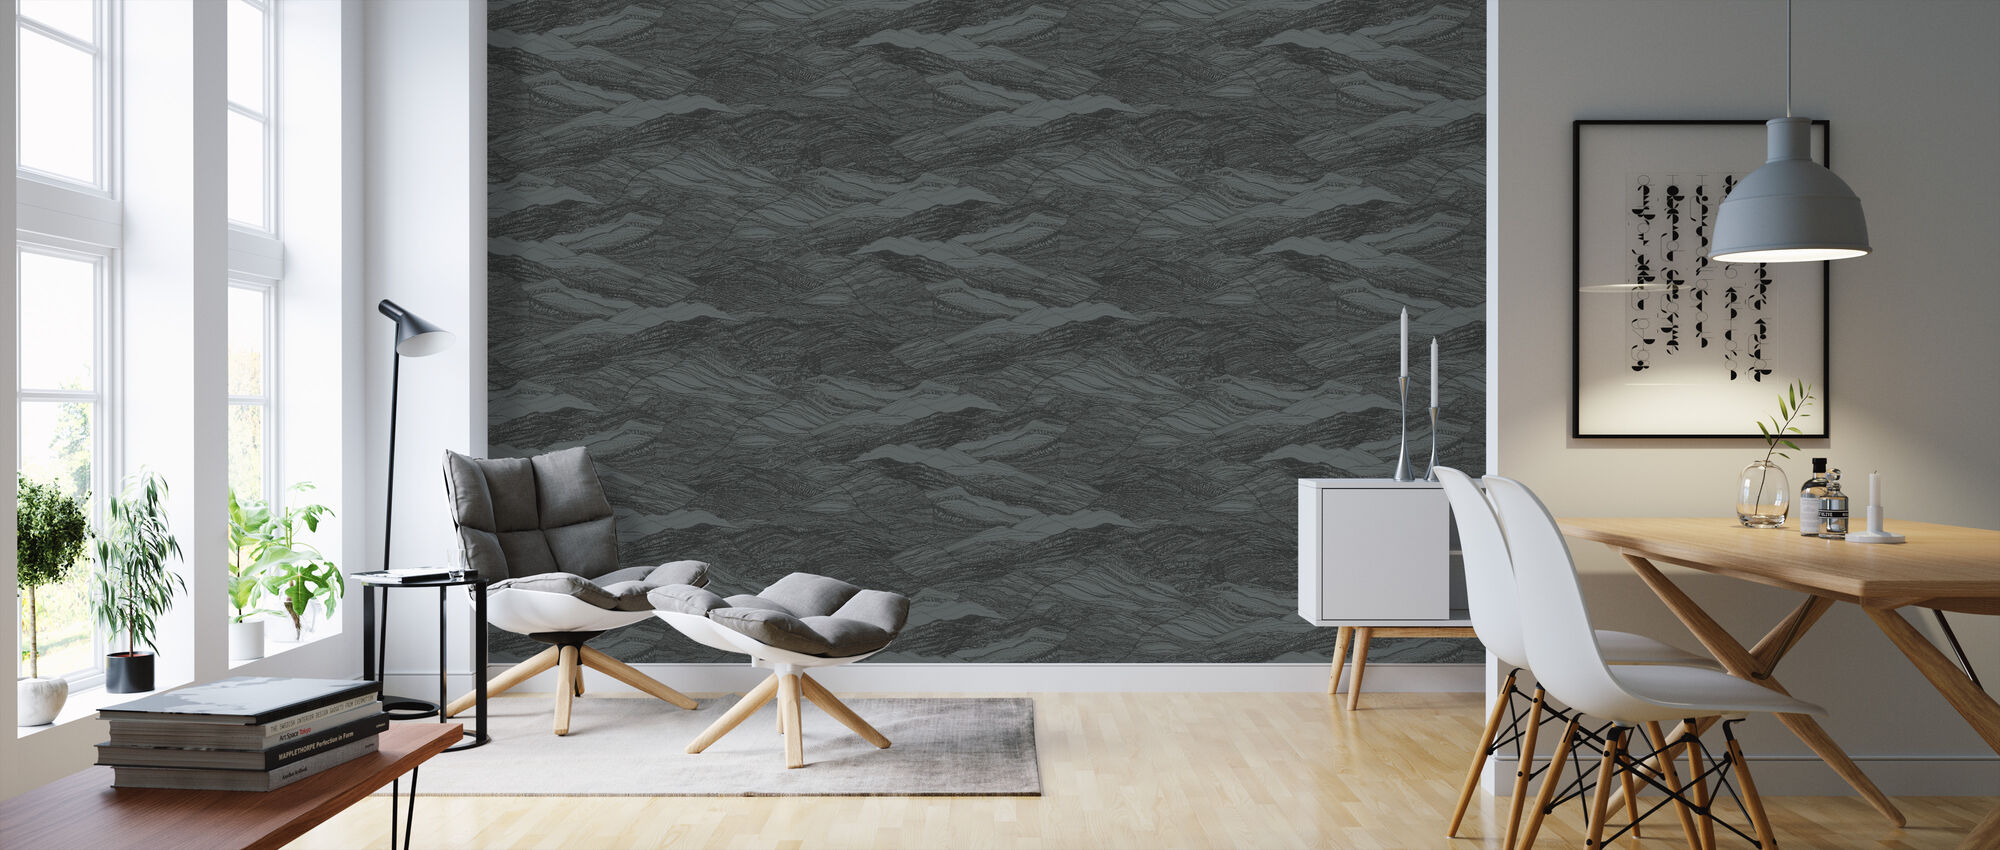 Duna Granite - Wallpaper - Living Room